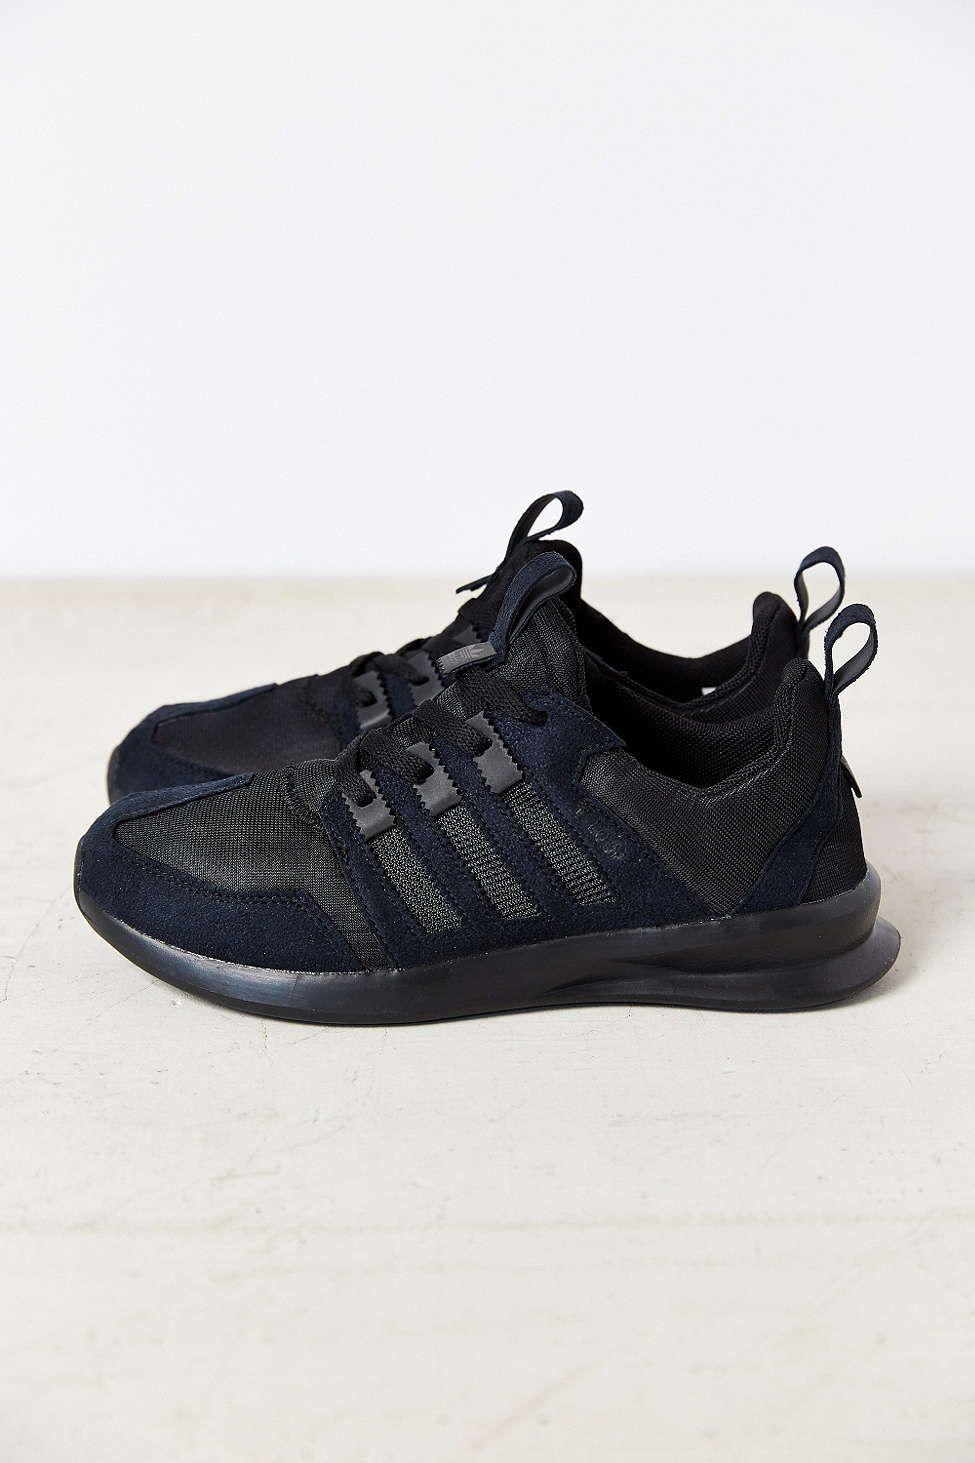 4e2eb9fce715 adidas Originals SL Loop Runner Sneaker - Urban Outfitters Sl Loop